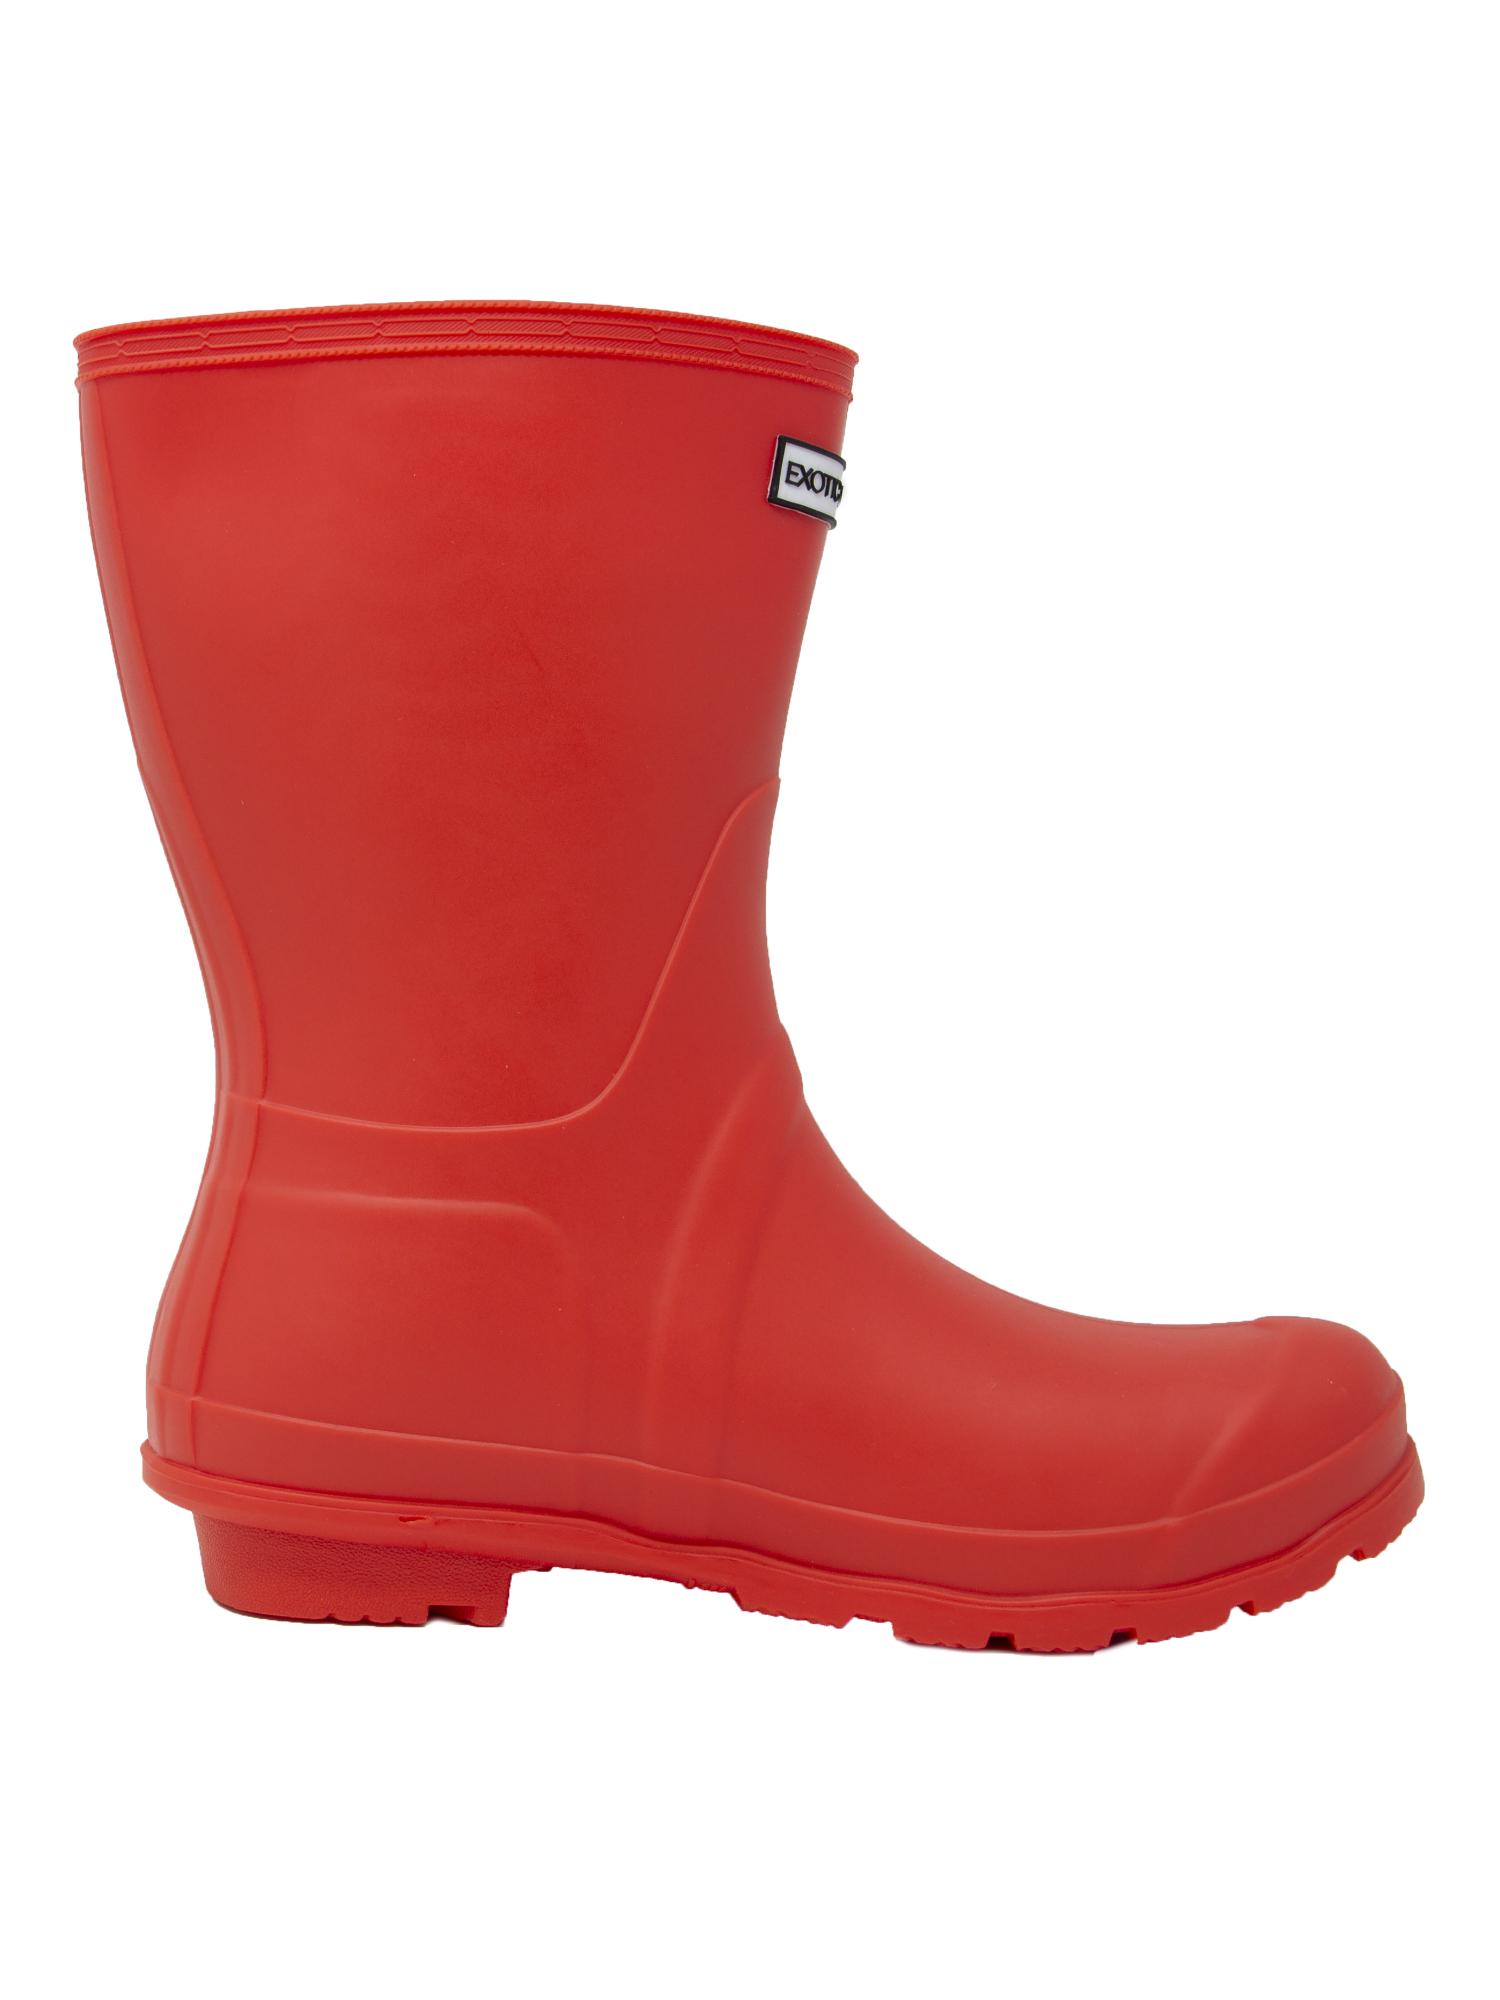 Exotic-Identity-Short-Rain-Boots-Non-Slip-100-Waterproof-for-Women thumbnail 15